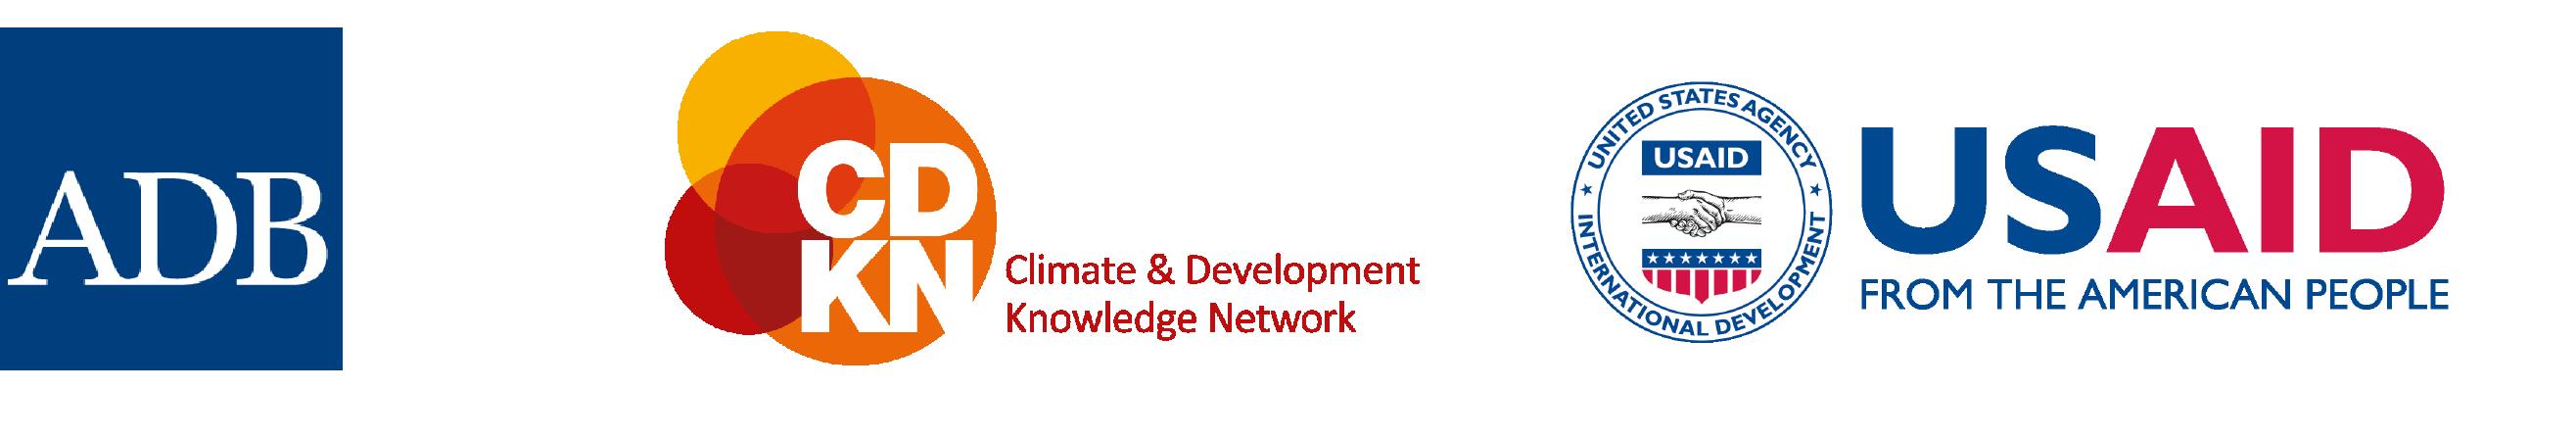 Logos of ADB< CDKN, and USAID